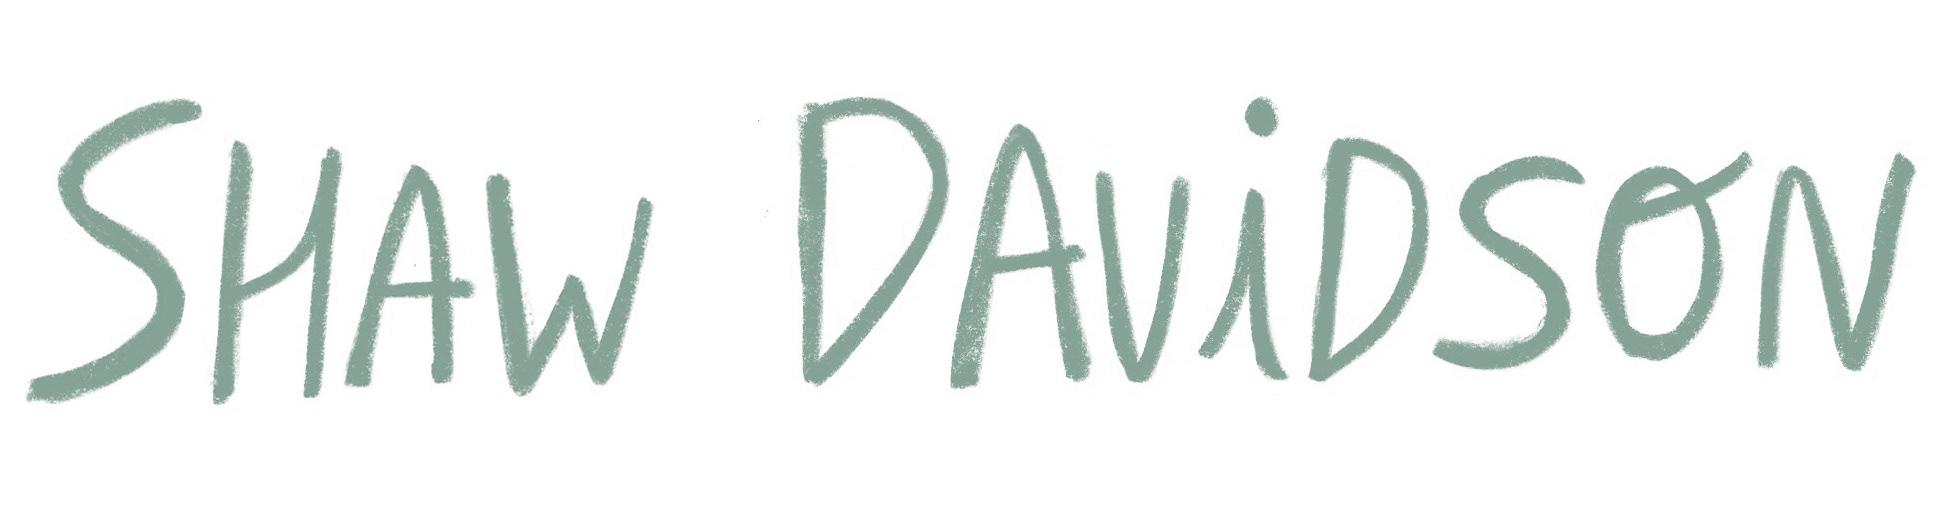 Shaw Davidson